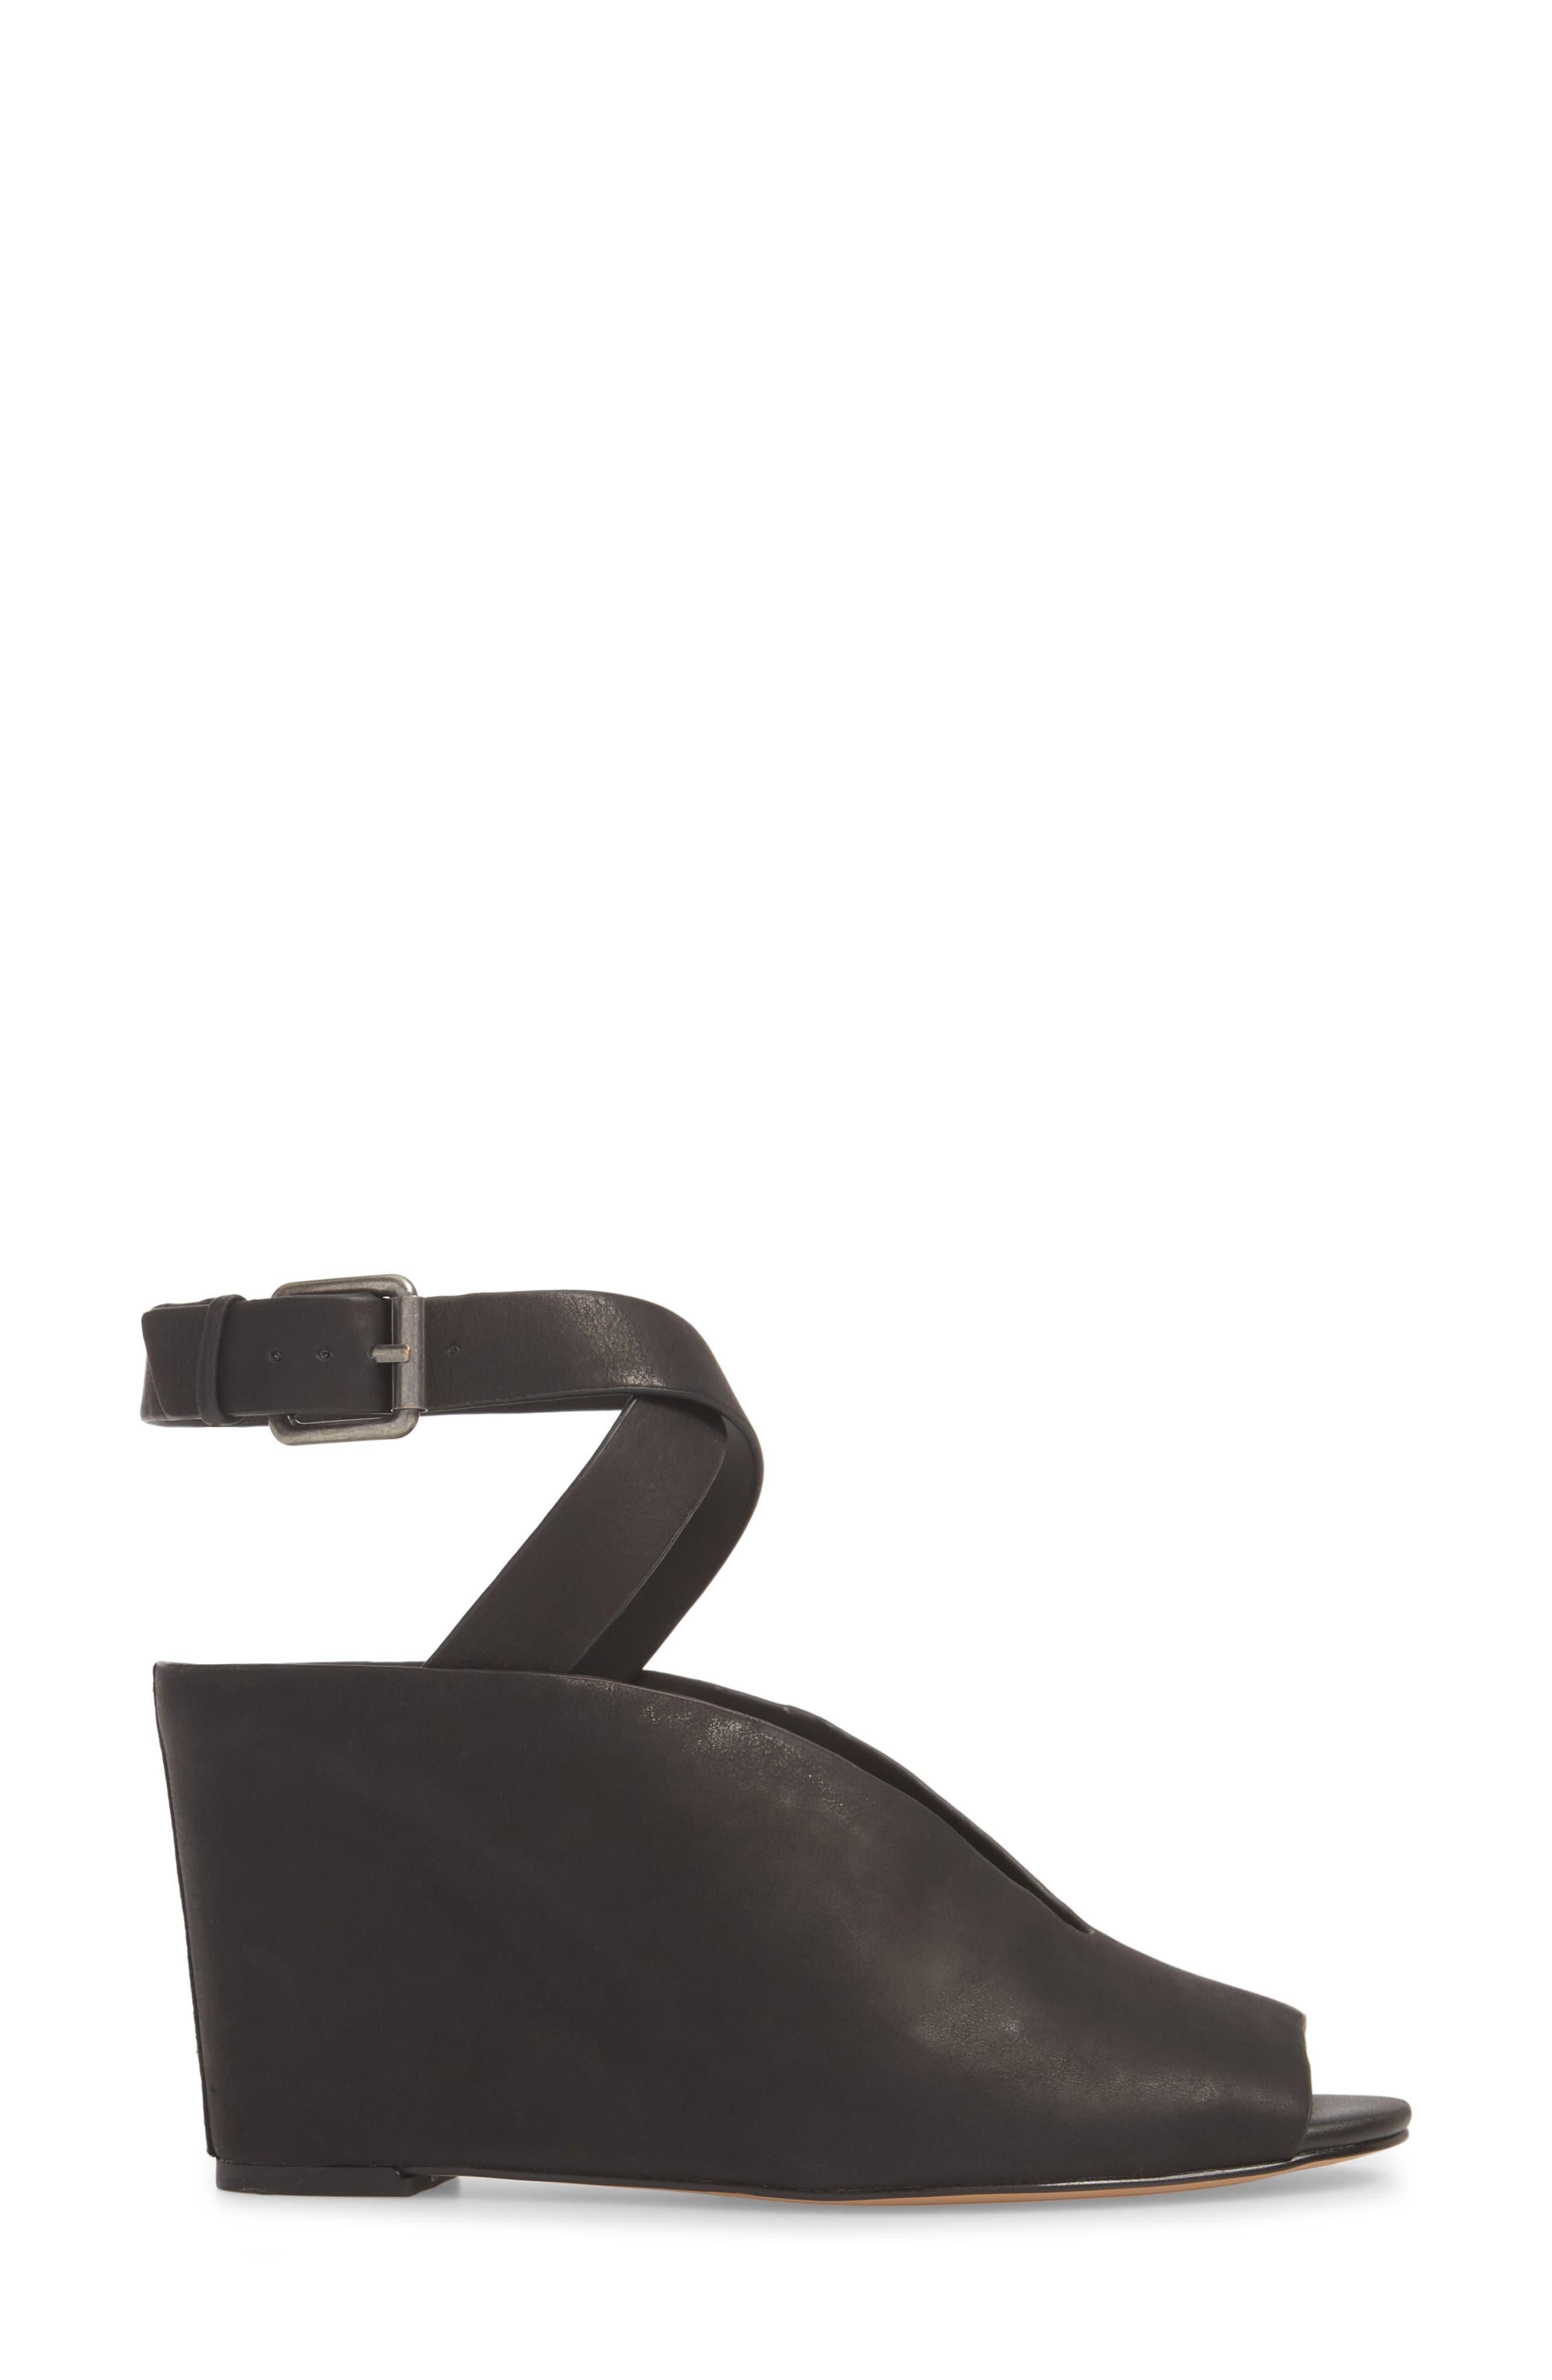 Felidia Wedge Sandal,                             Alternate thumbnail 3, color,                             Black Leather